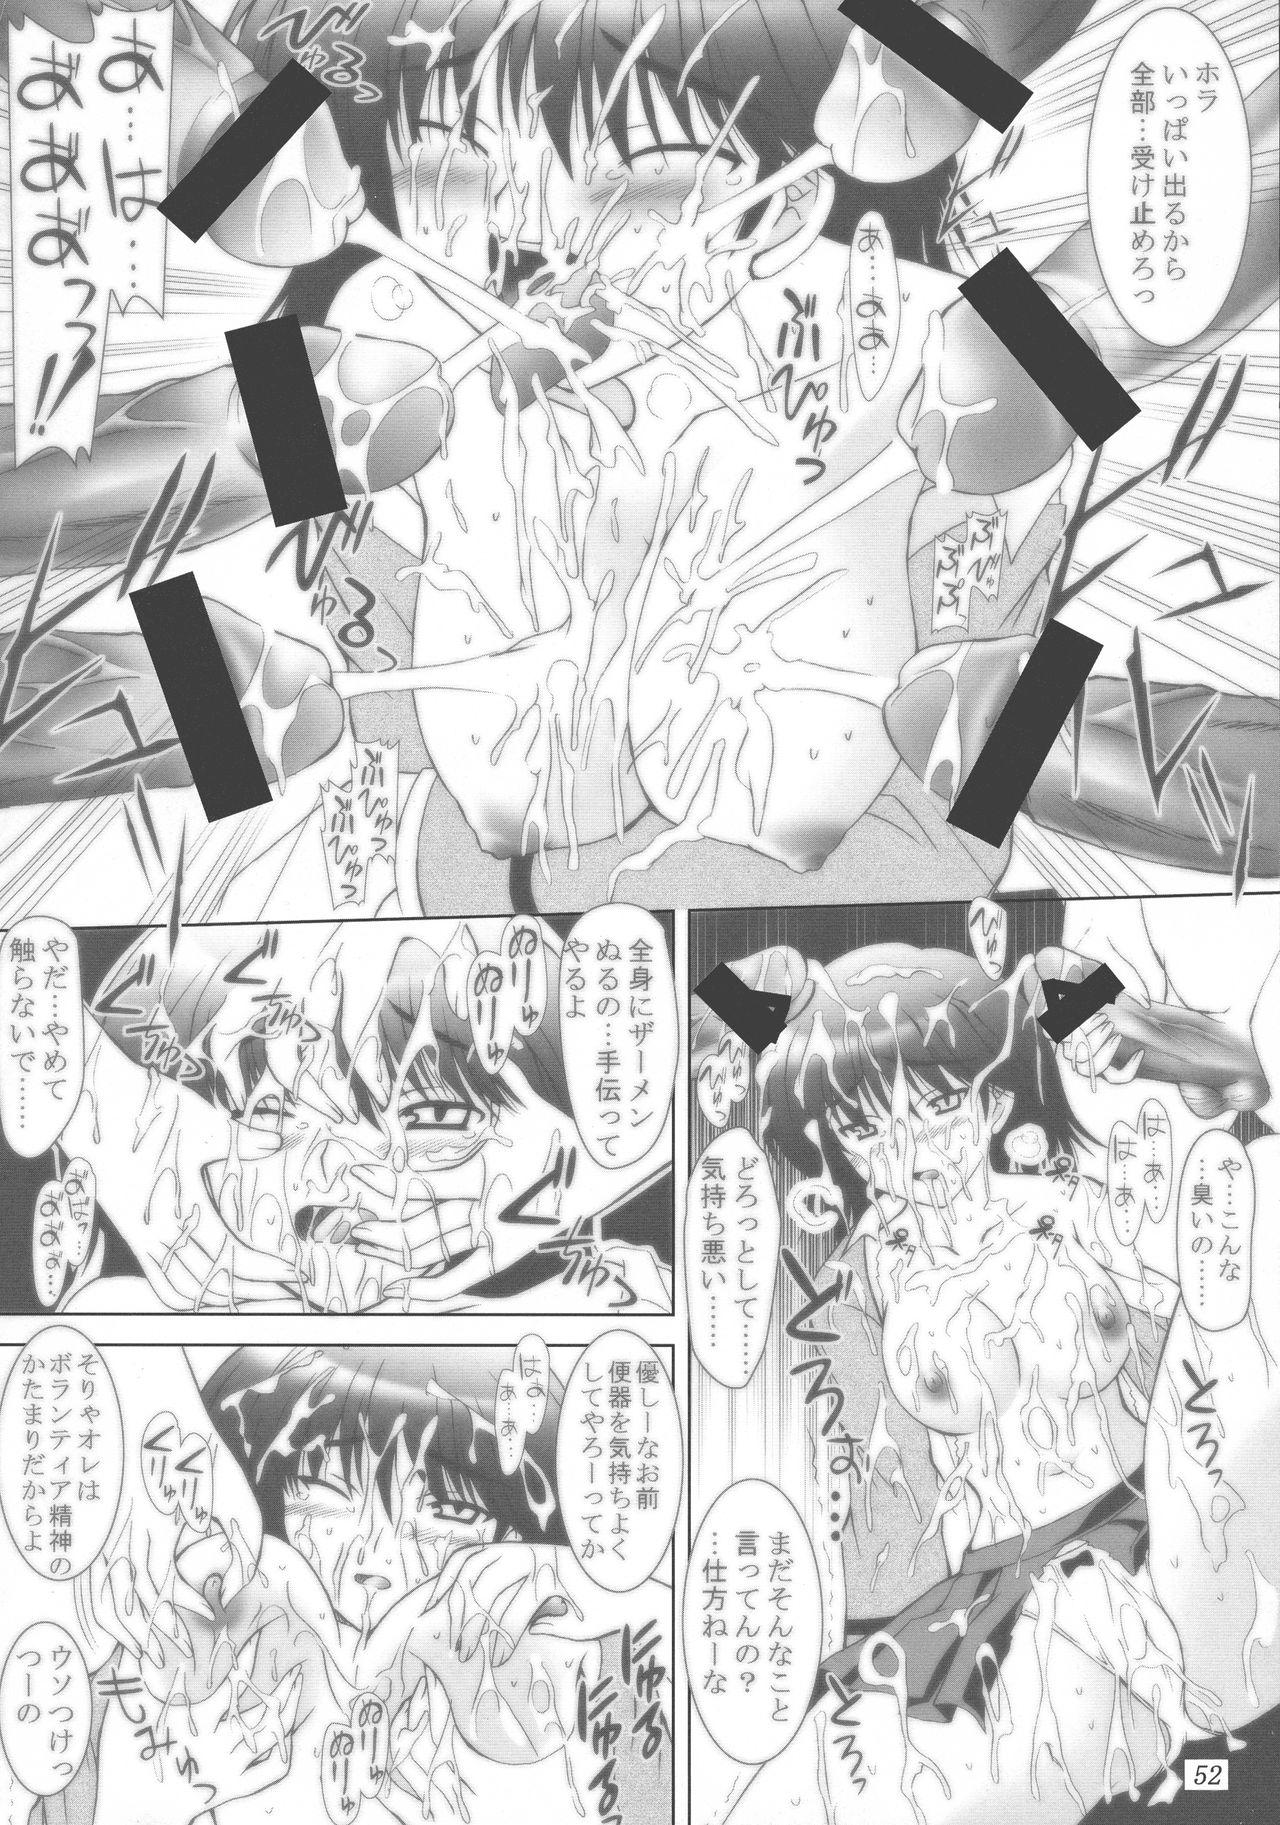 (C73) [ashitakara-ganbaru (Yameta Takashi)] ZIG-ZIG-ZIG 3 -2004~2005- (Various) 51